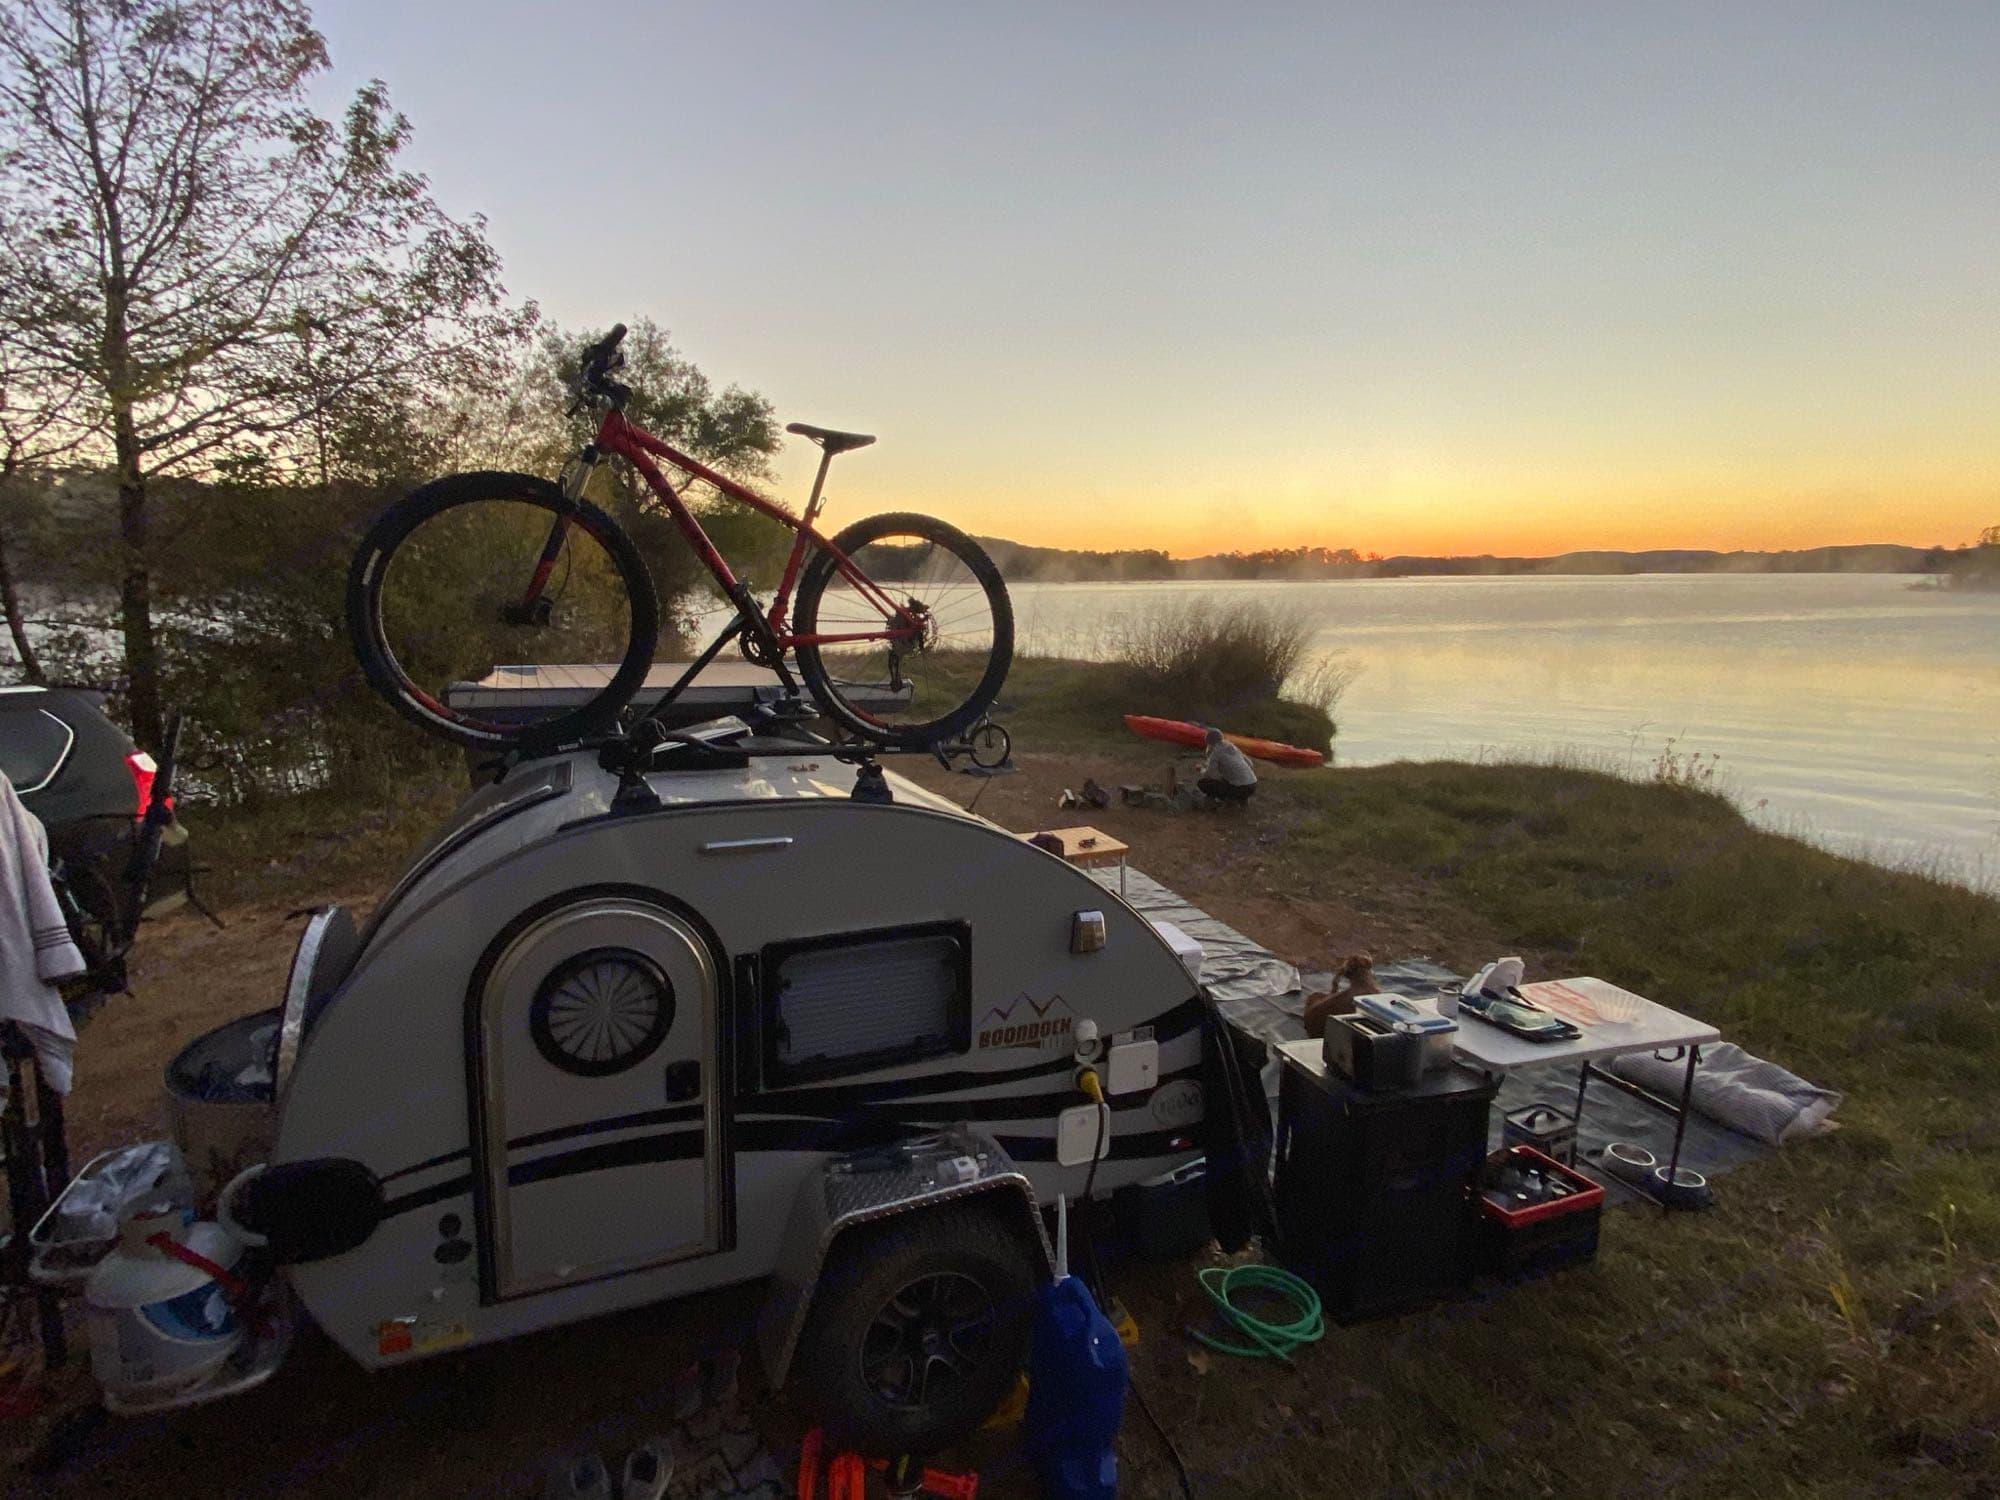 sunrise. Nucamp T@G Boondock 2020